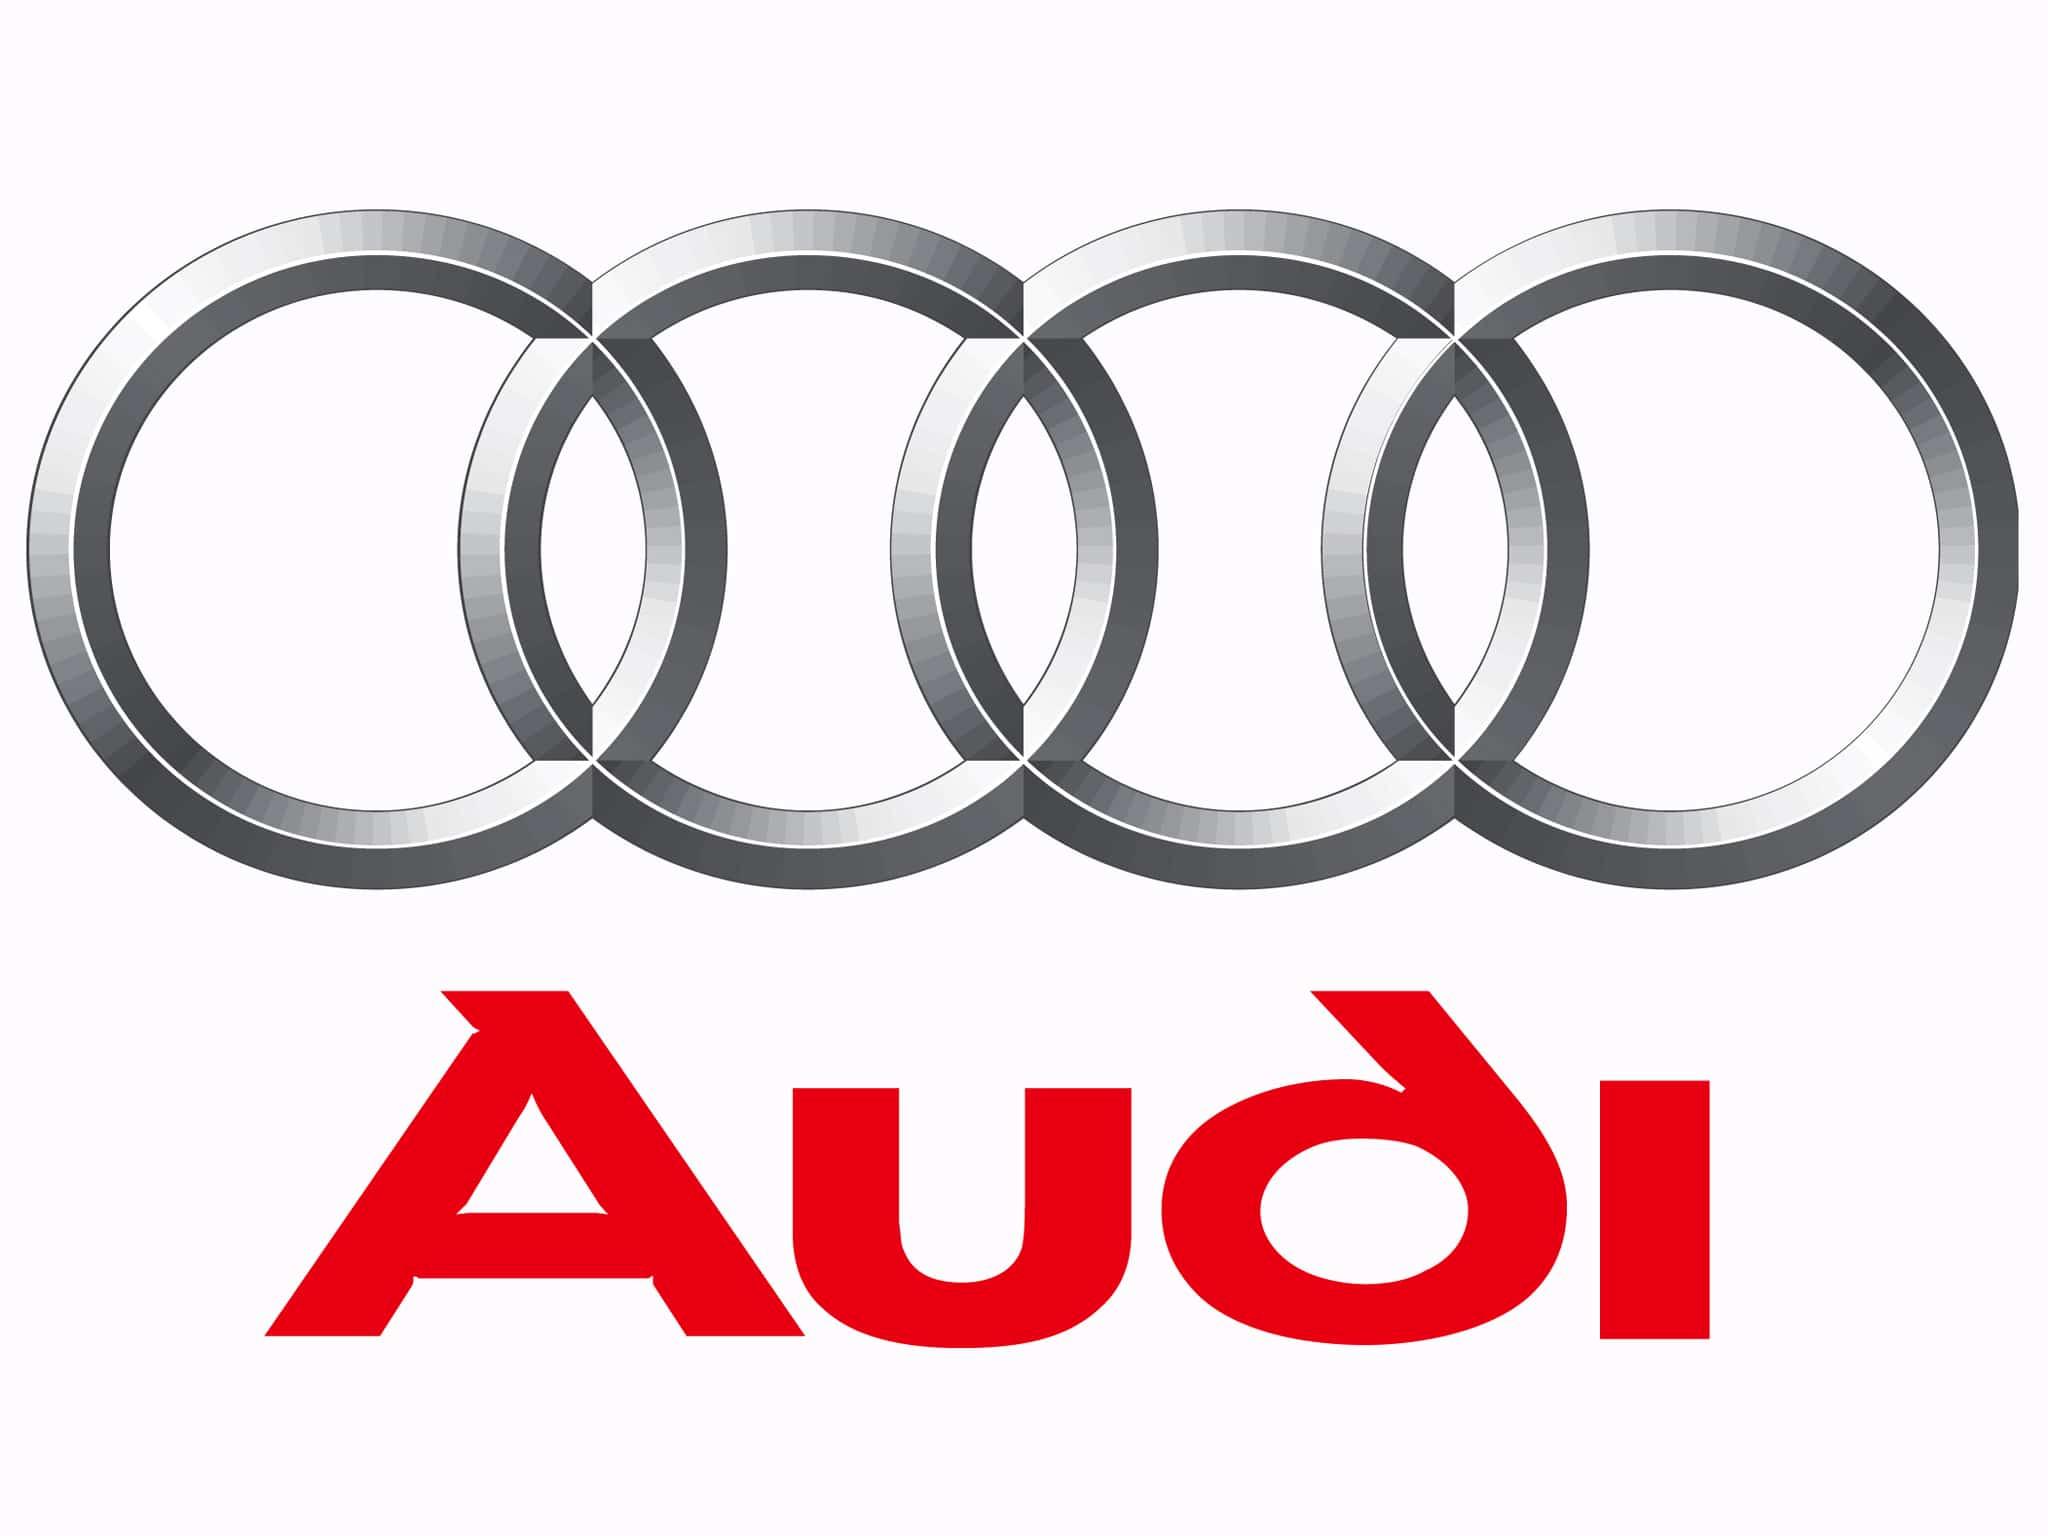 Manual Audi Q2 2010 Reparación